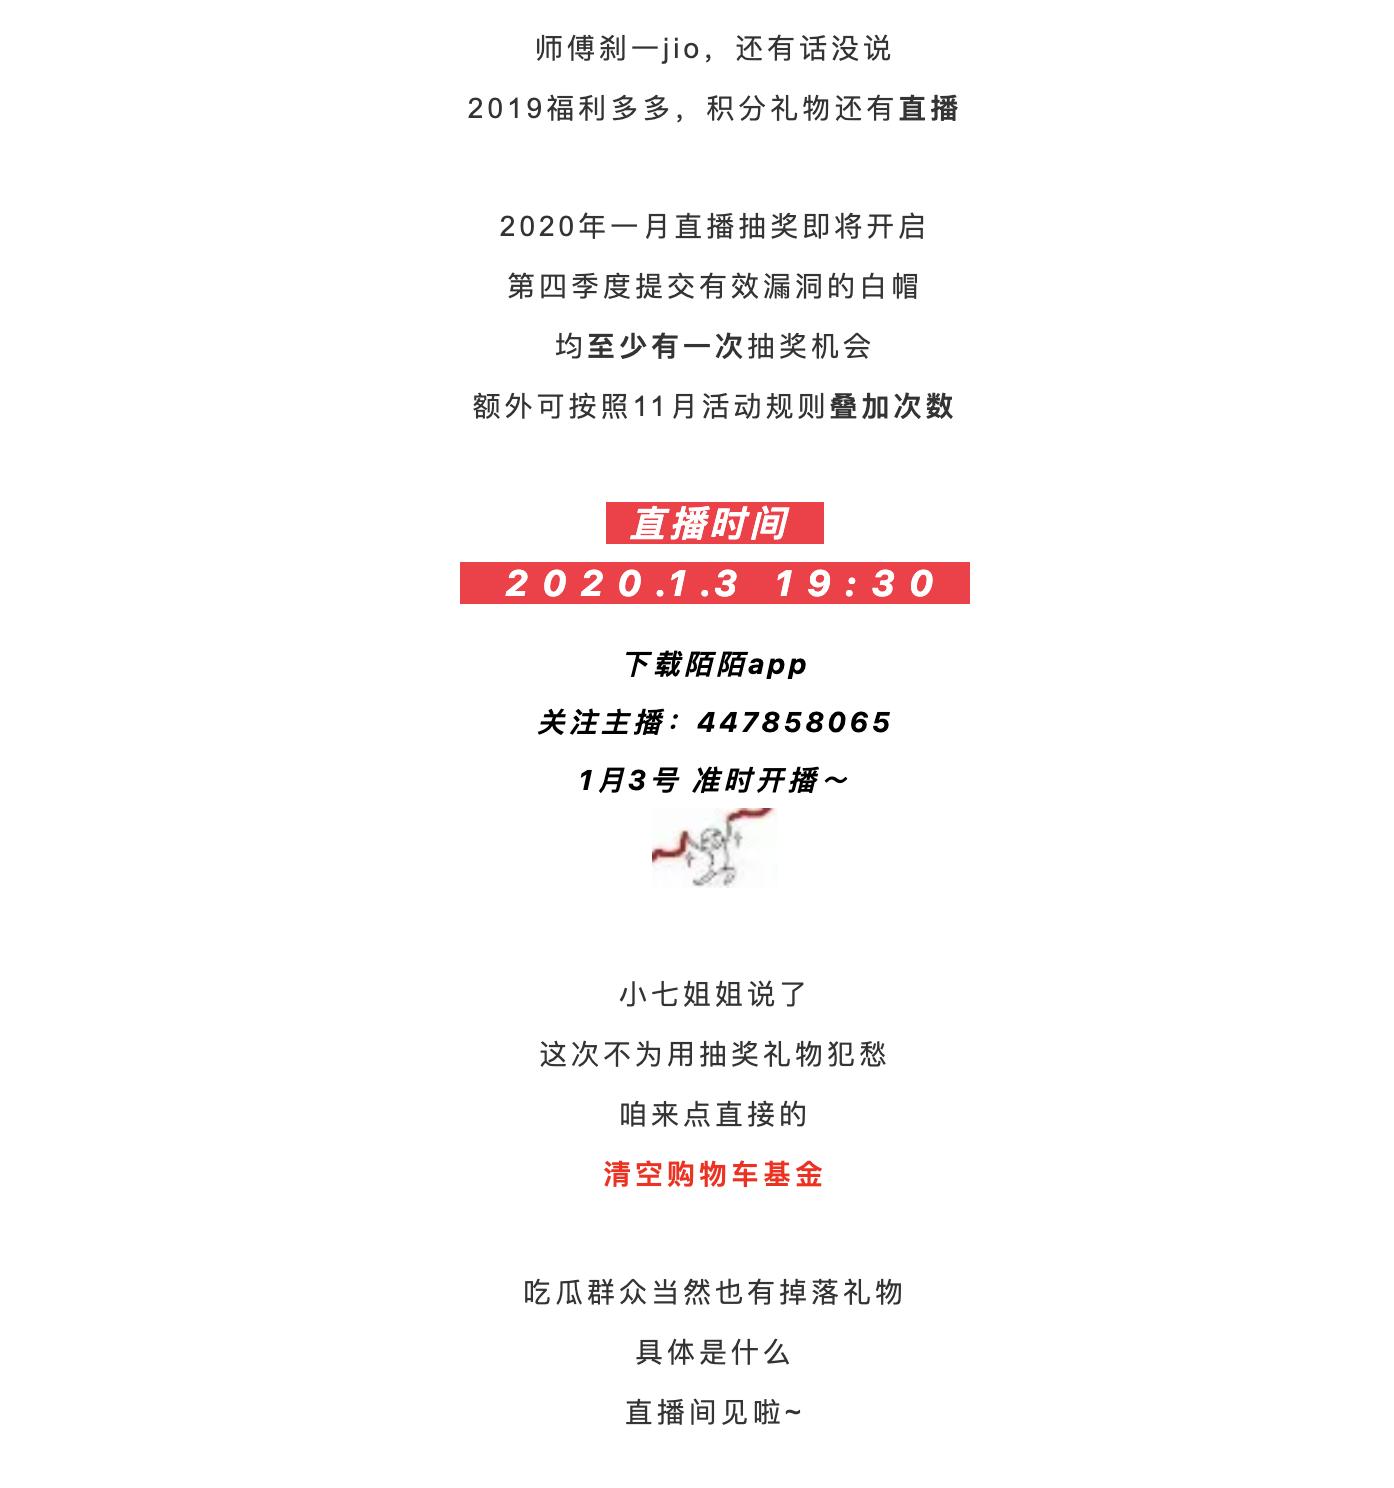 https://momo-mmsrc.oss-cn-hangzhou.aliyuncs.com/img-4157d282-fdc0-396e-8fa5-1df46dbe02a3.png